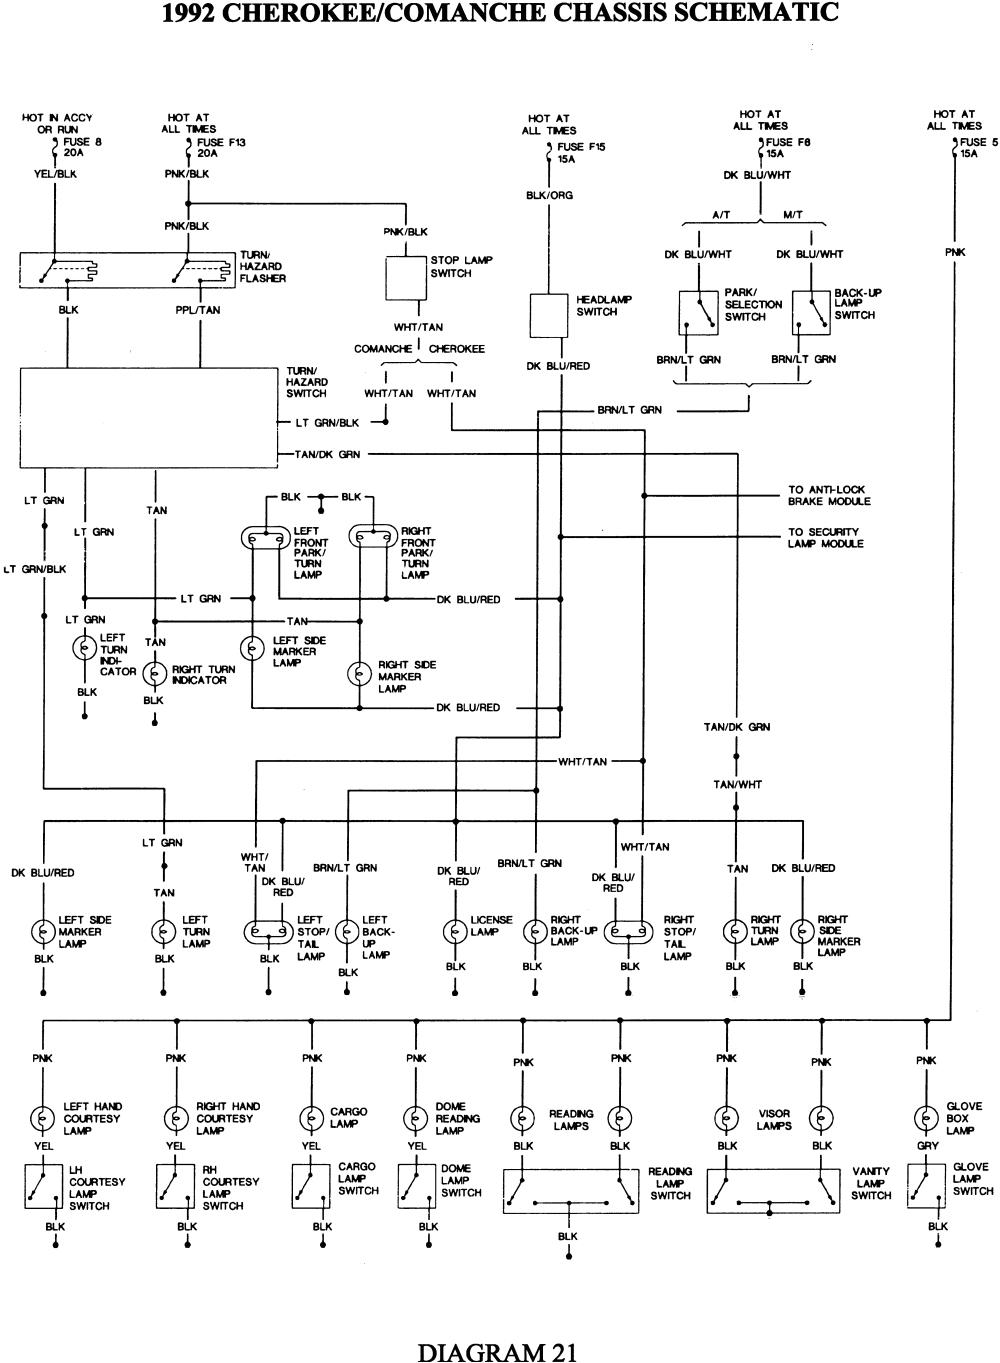 repair guides wiring diagrams see figures 1 through 50 jeep cherokee wiring diagram 2000 jeep xj wiring diagram